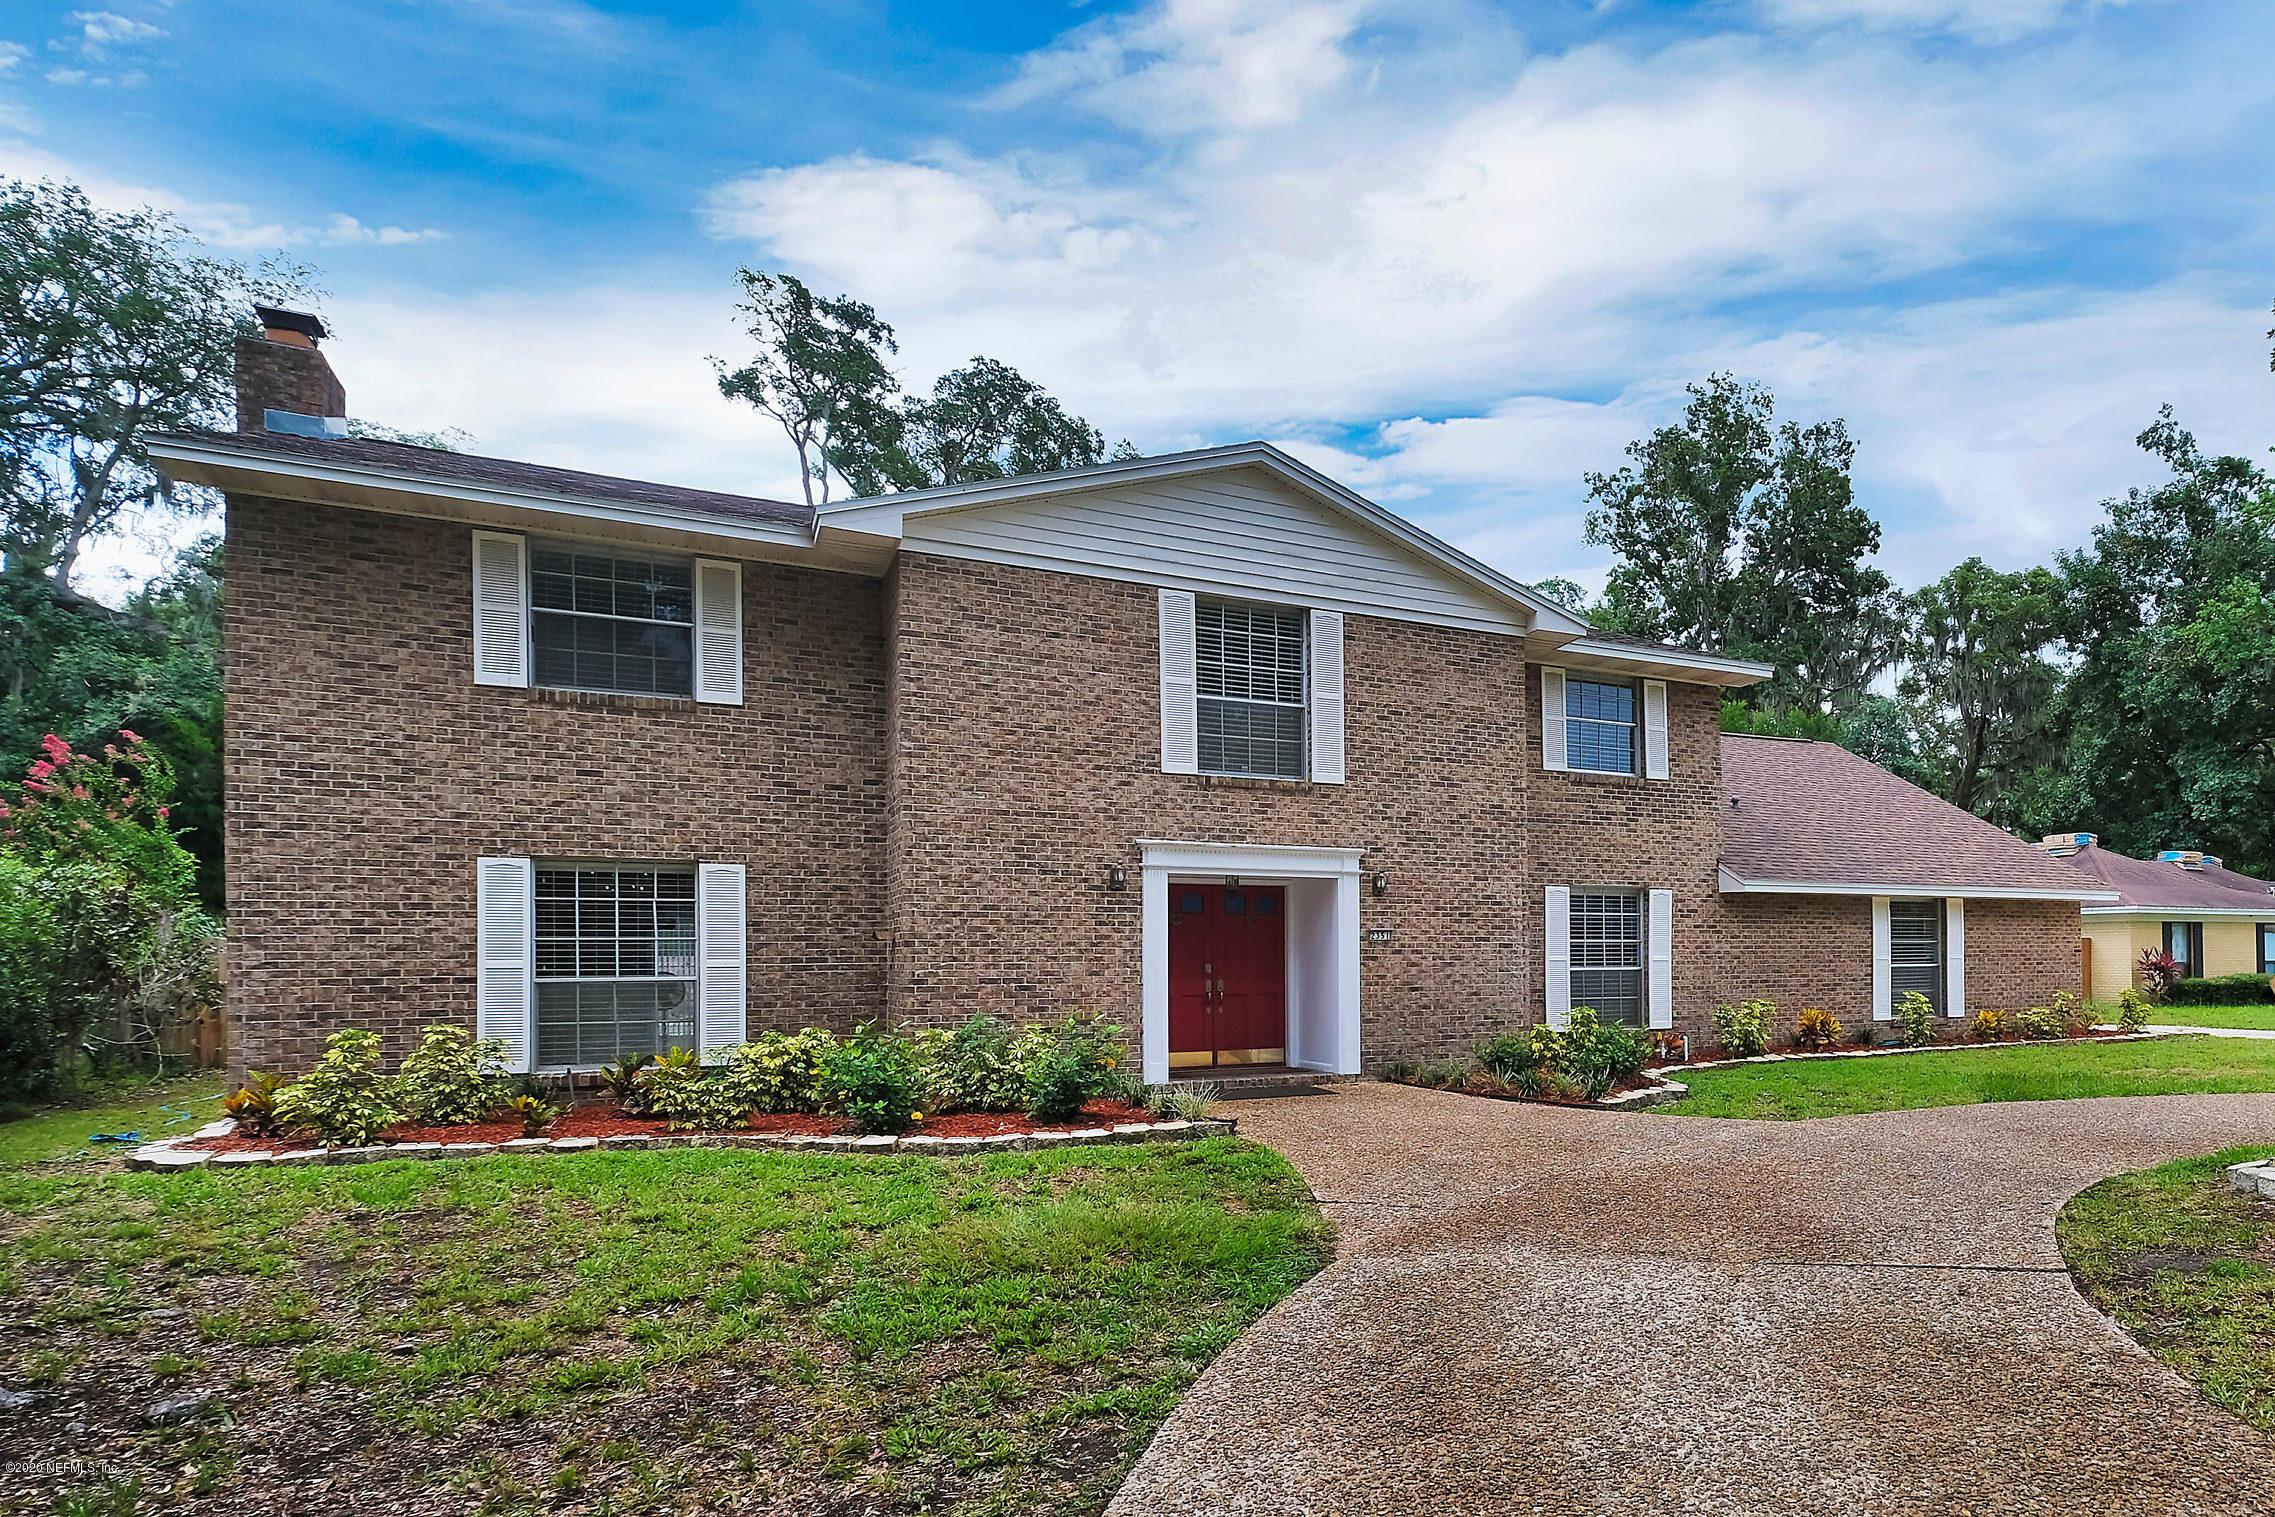 2351 EGREMONT, ORANGE PARK, FLORIDA 32073, 5 Bedrooms Bedrooms, ,3 BathroomsBathrooms,Residential,For sale,EGREMONT,1064762